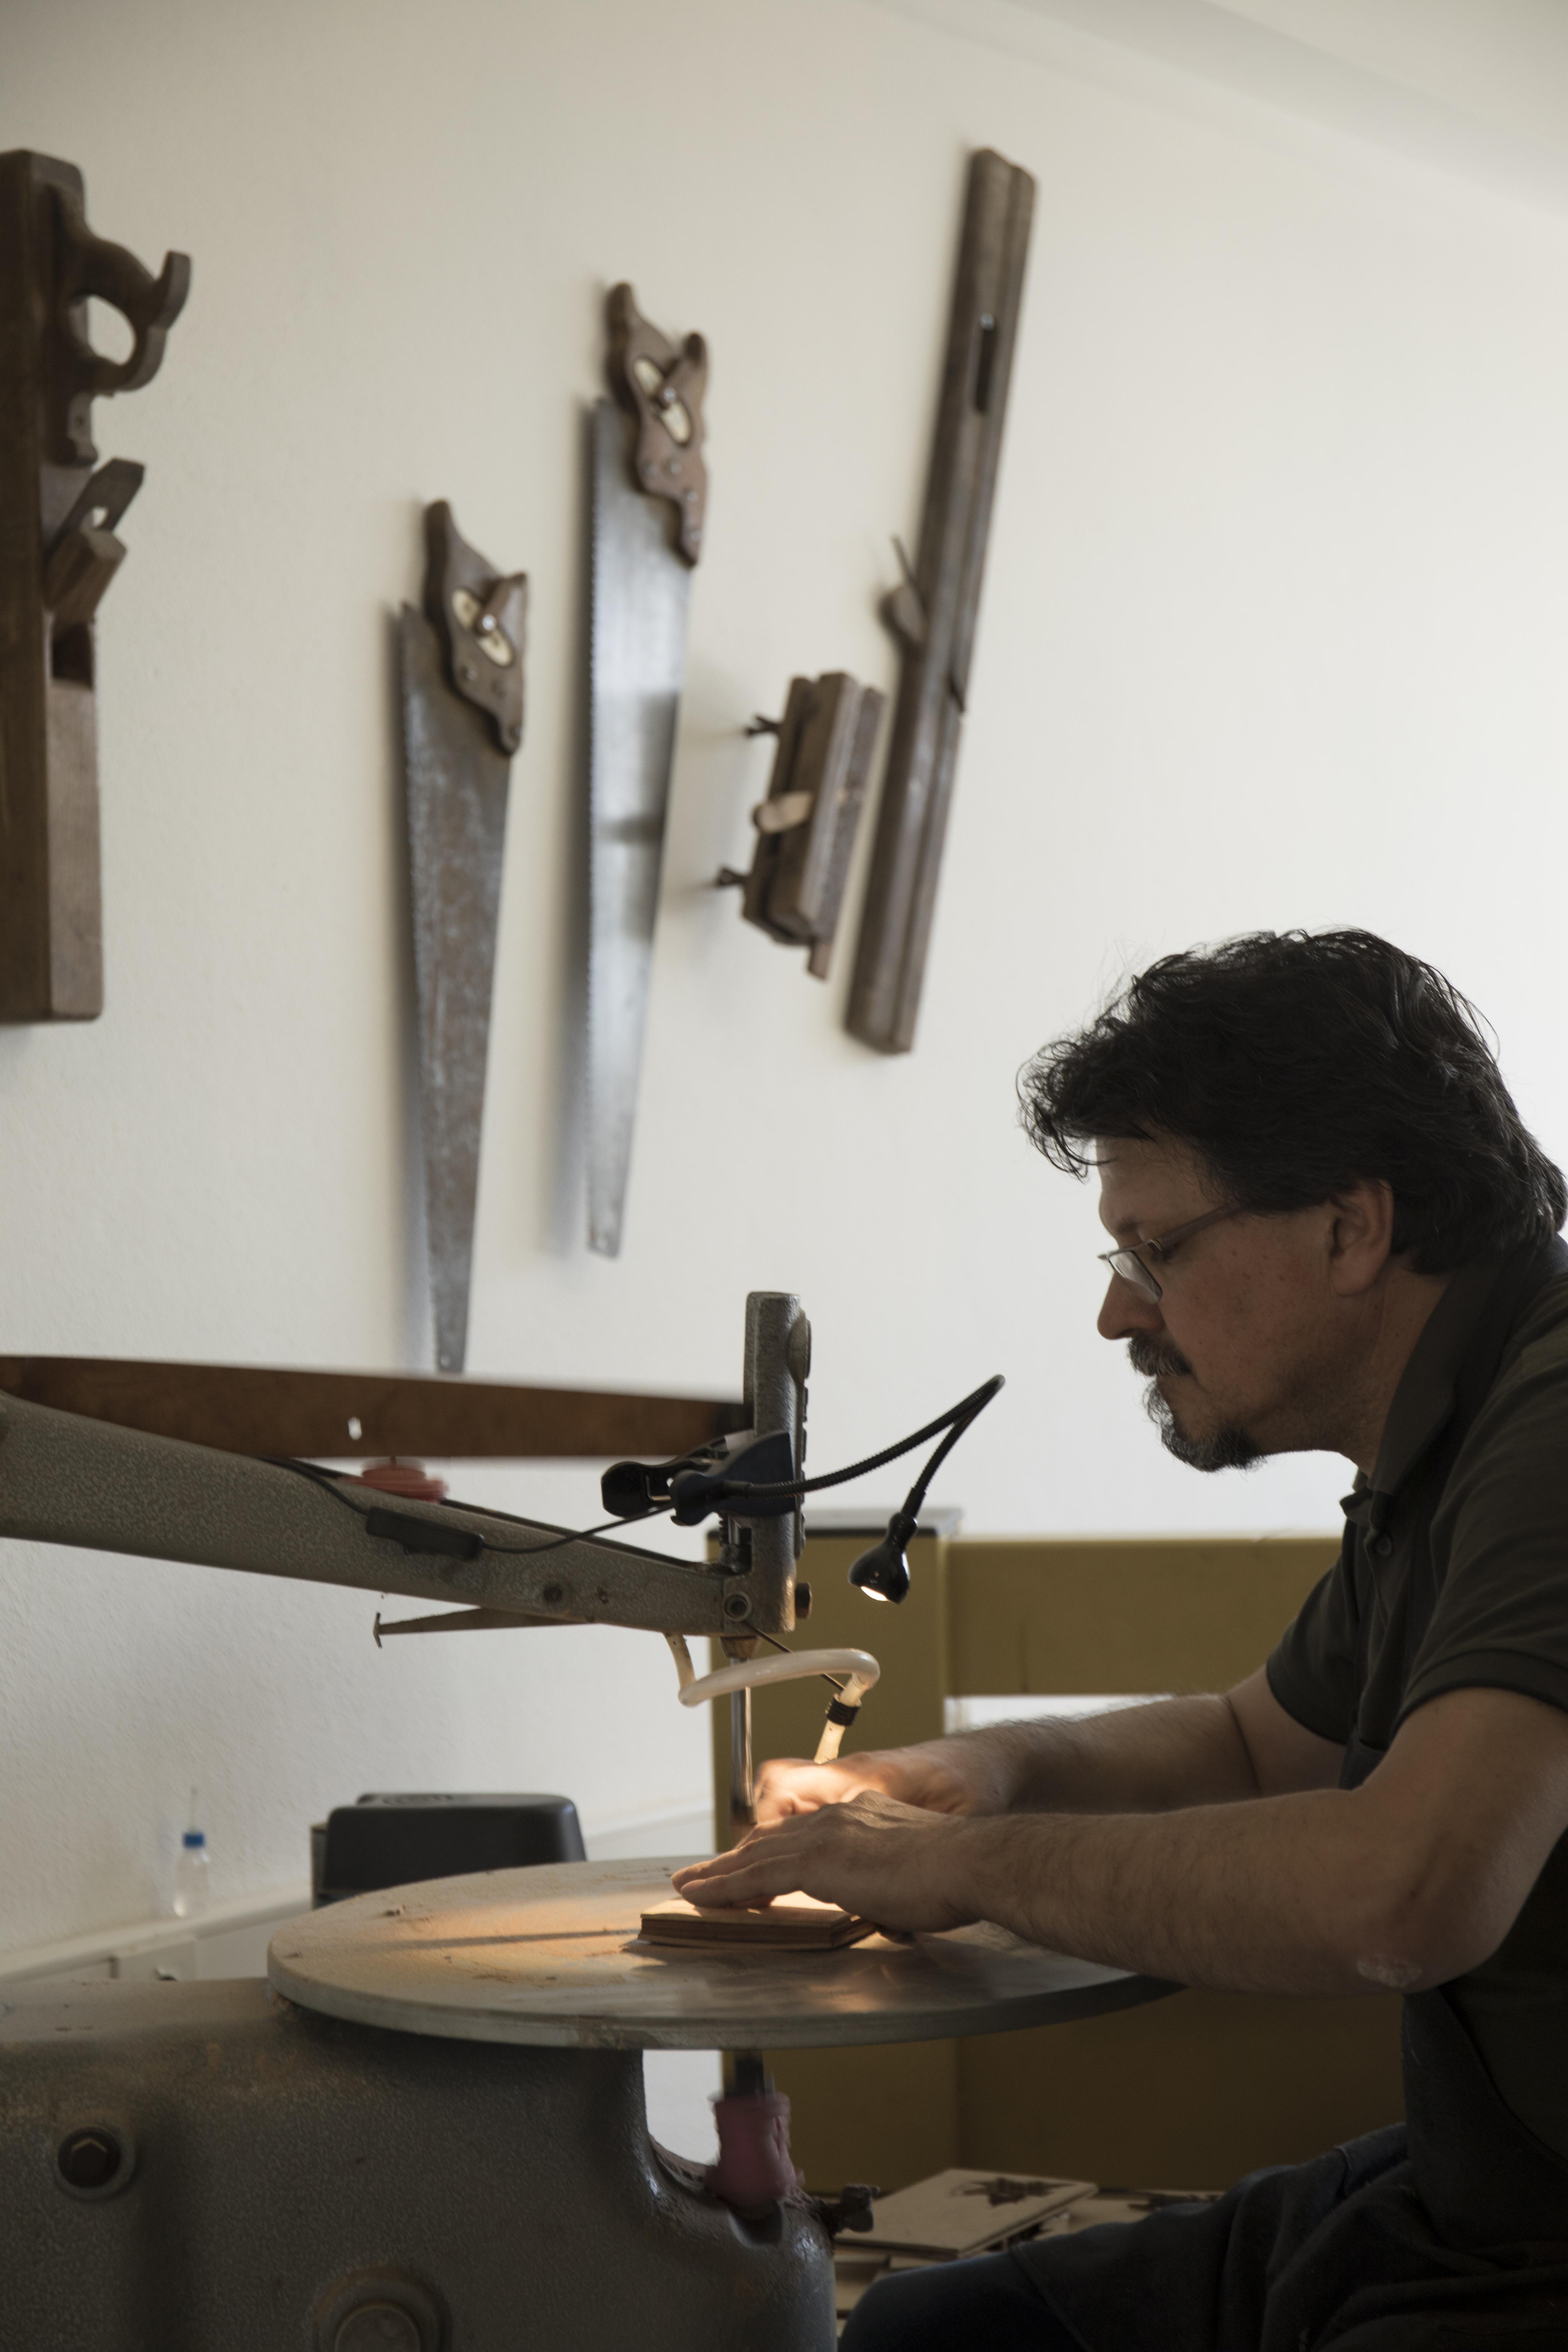 Masterpieces by Project CULTURE - Maison et Objet 2019 - Woodworker wood carving Ancient Art of Wood Carving Represented at Maison et Objet 2019 Masterpieces by Project CULTURE Maison et Objet 2019 Woodworker